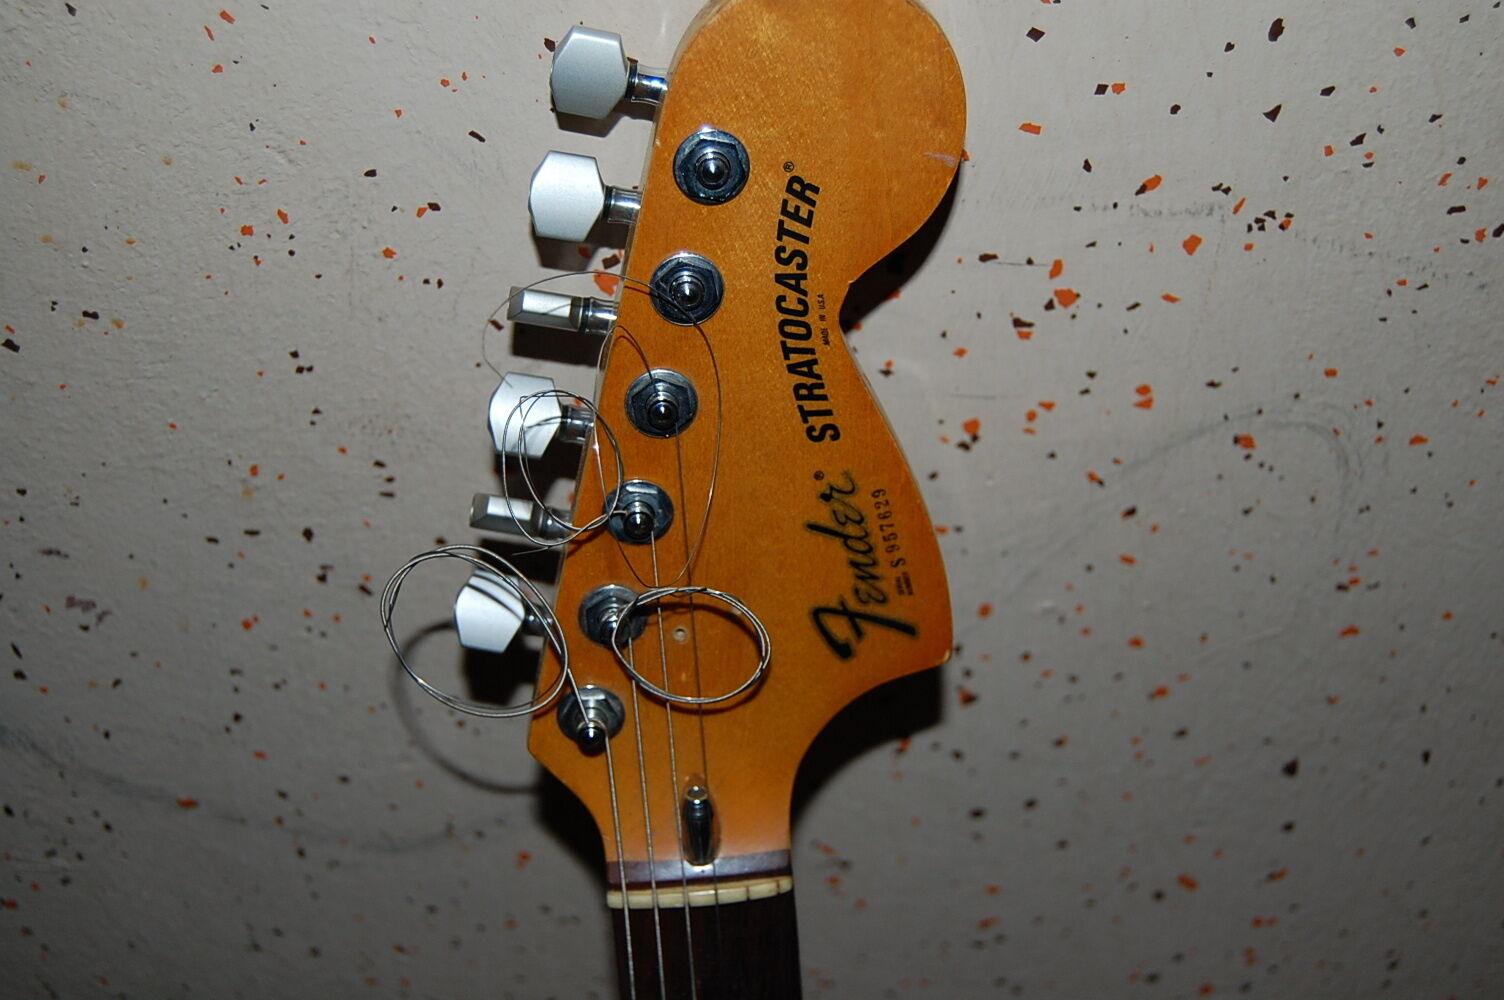 Fender Stratocaster, USA Vintage Bj. 1979